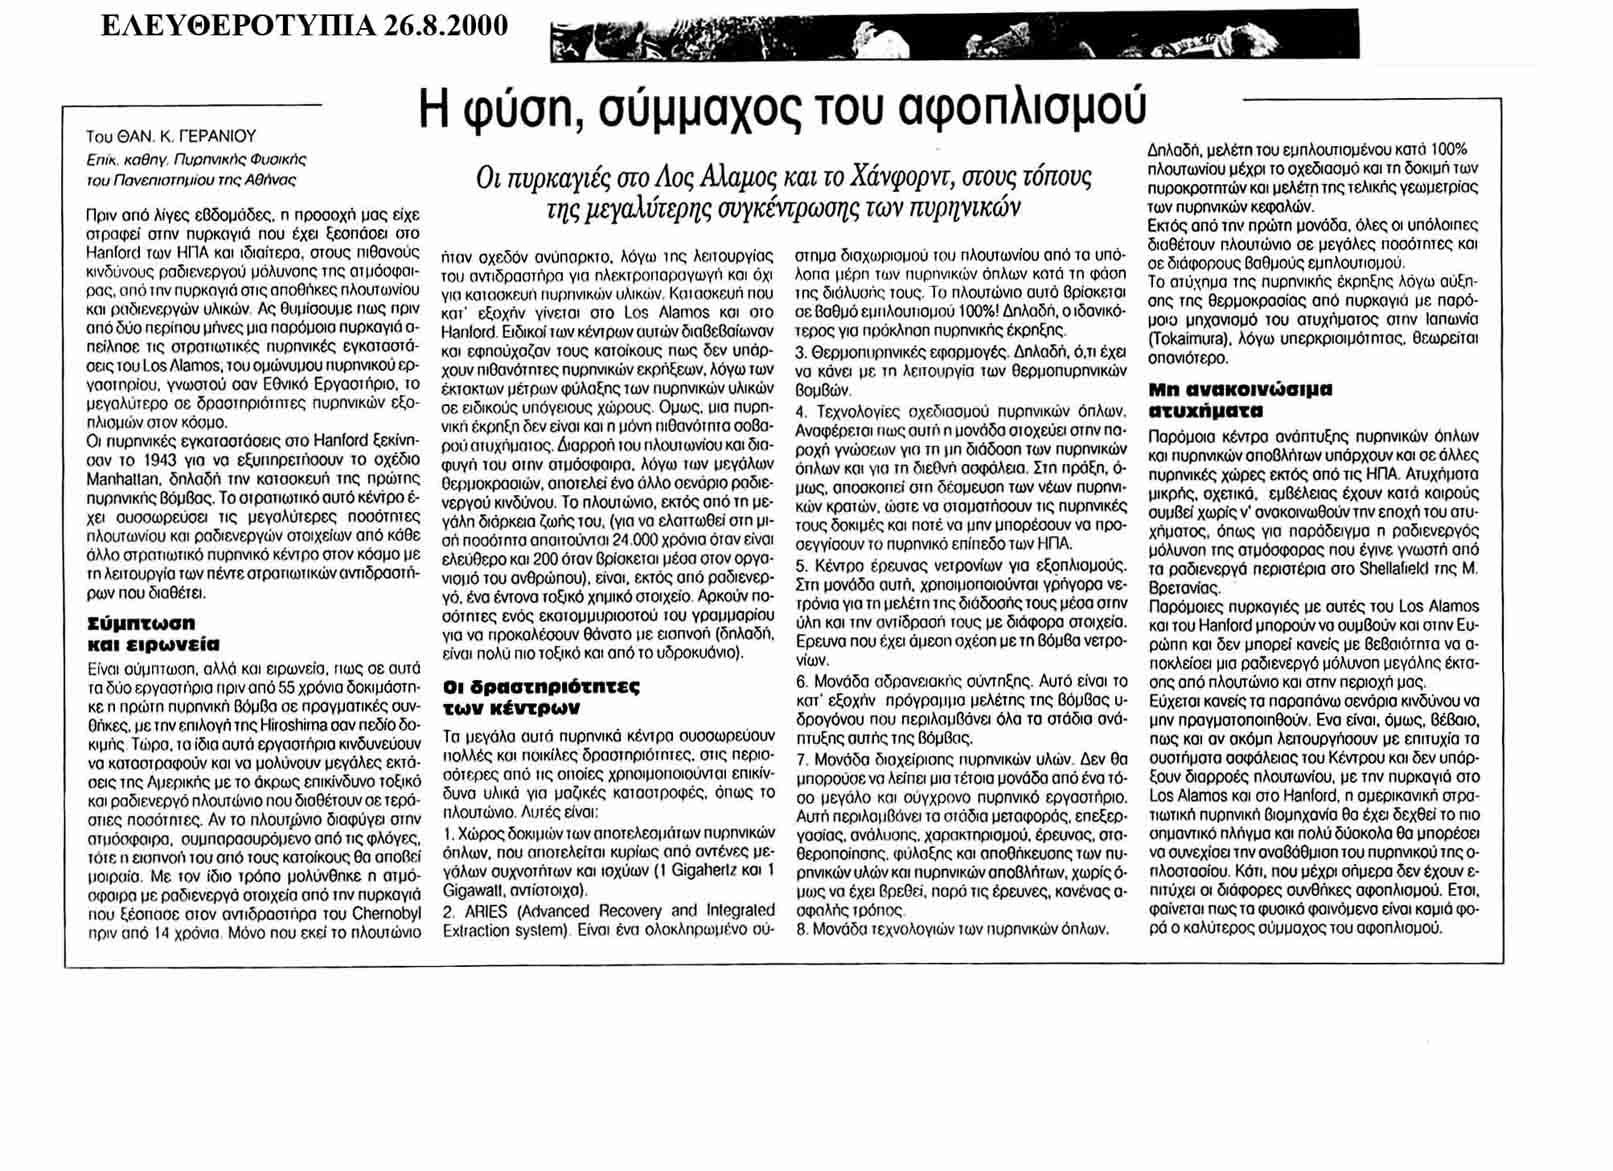 Dimitrios Mytilinaios - uoa.academia.edu